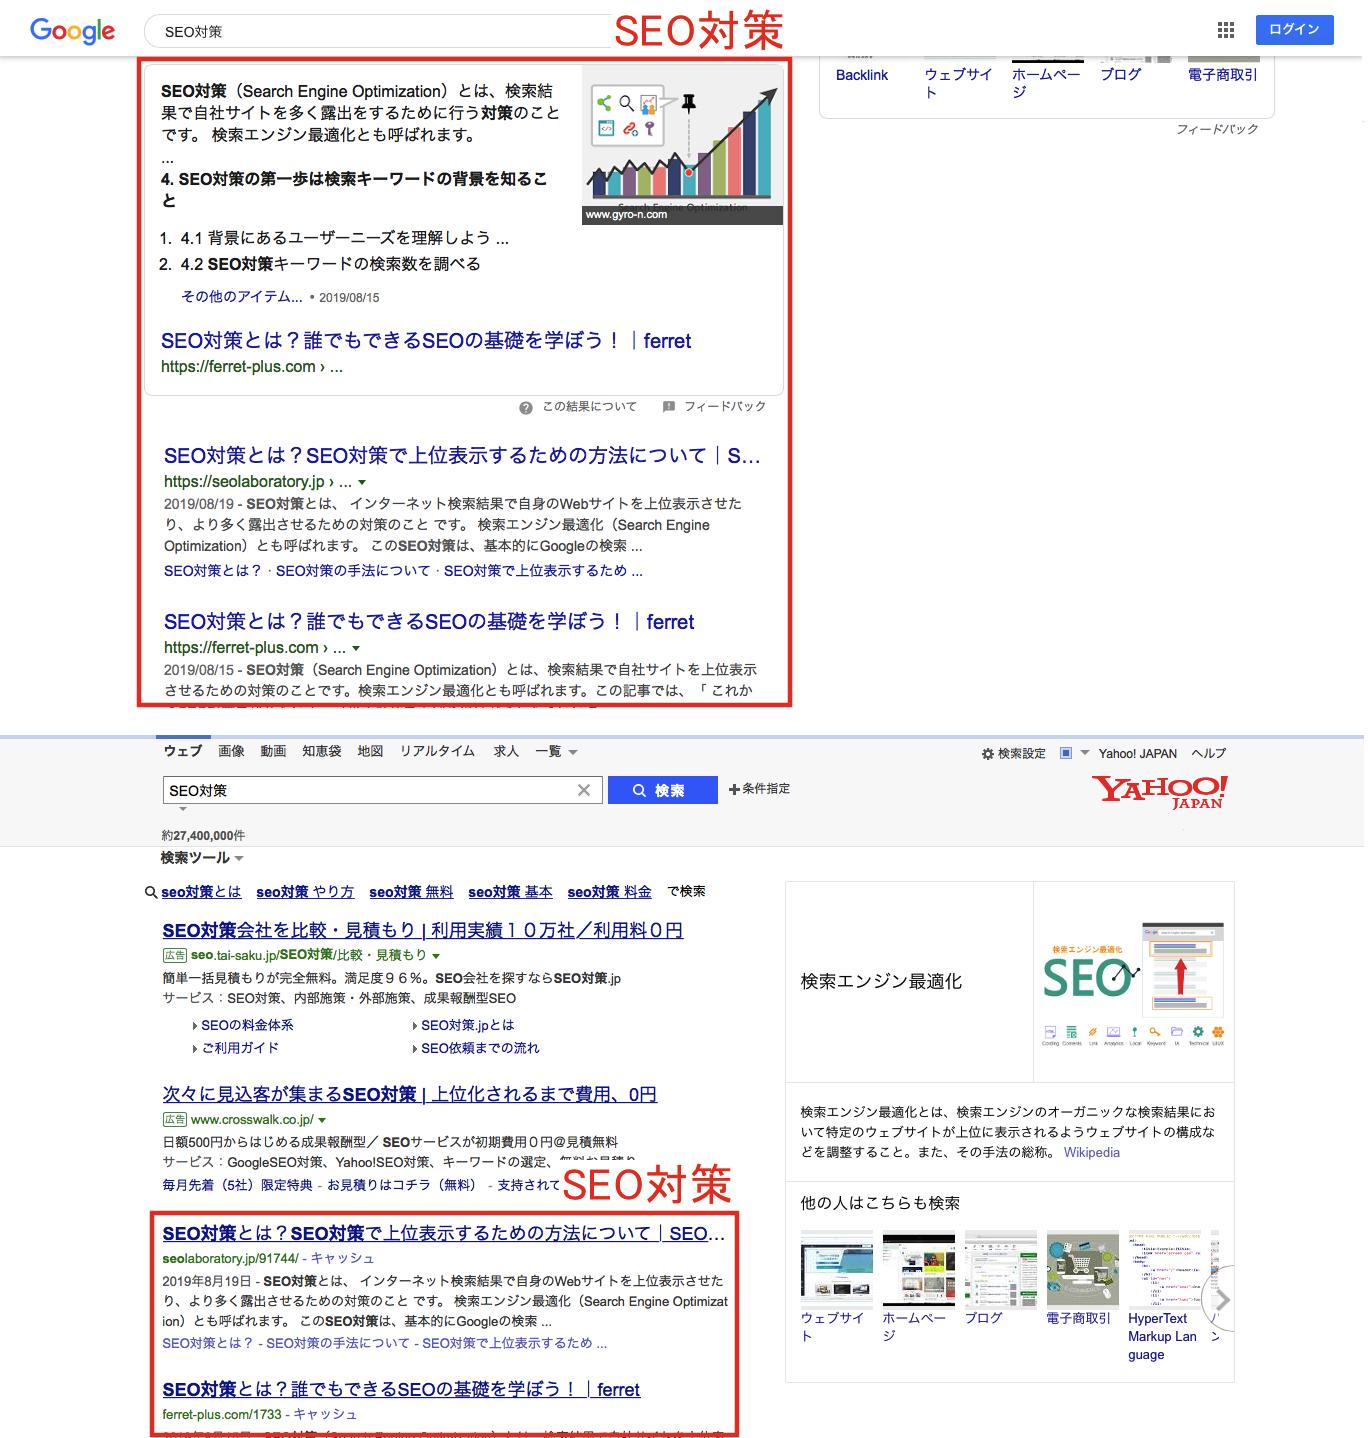 google-yahoo-search-keyword-seo-seo-content-2